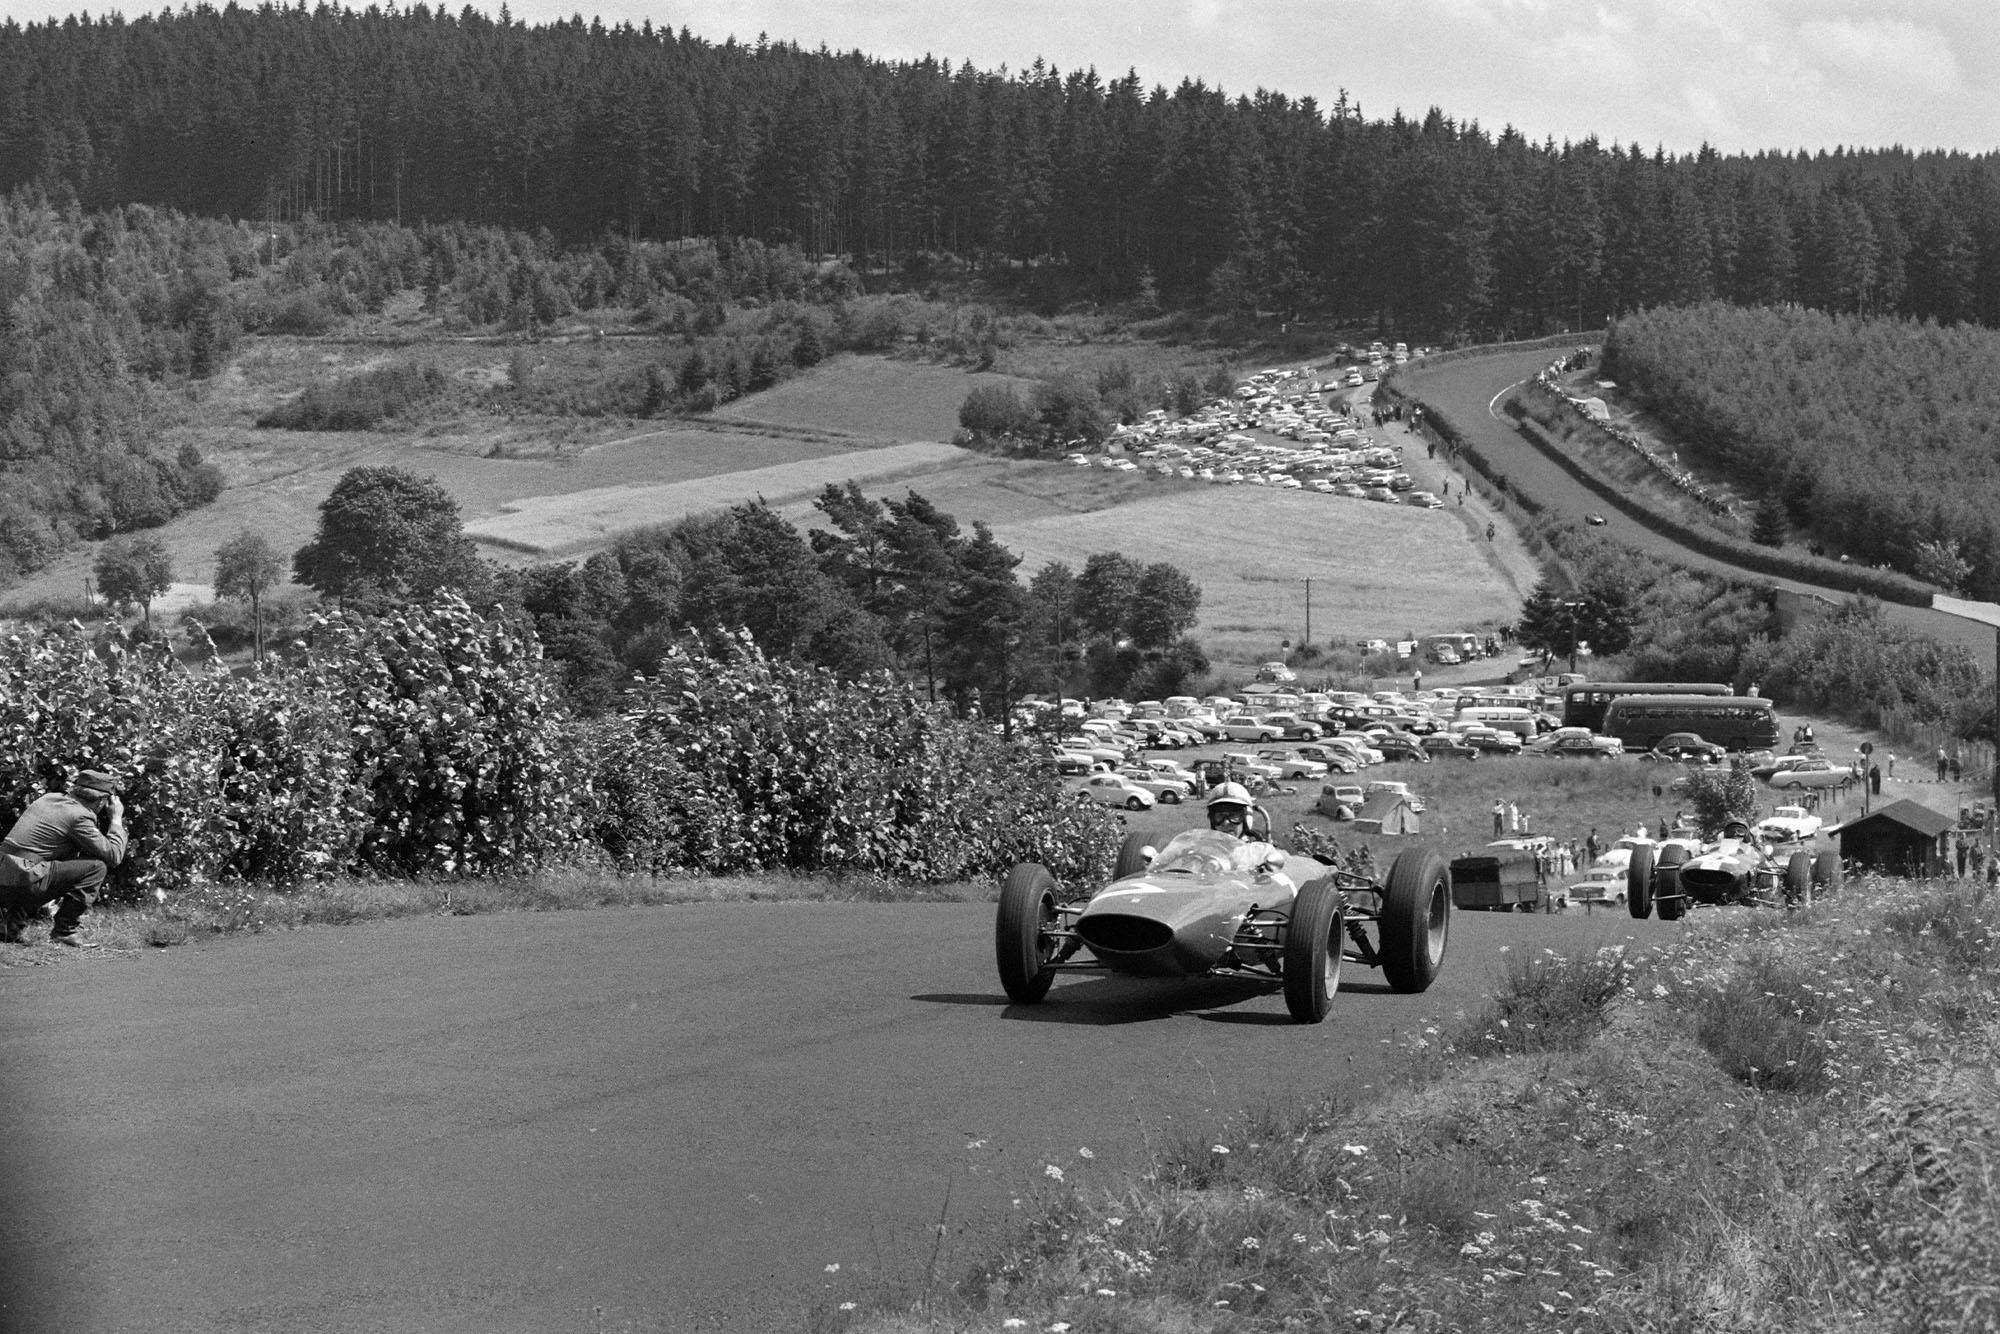 John Surtees, Ferrari 156/63, leads Jim Clark, Lotus 25 Climax.